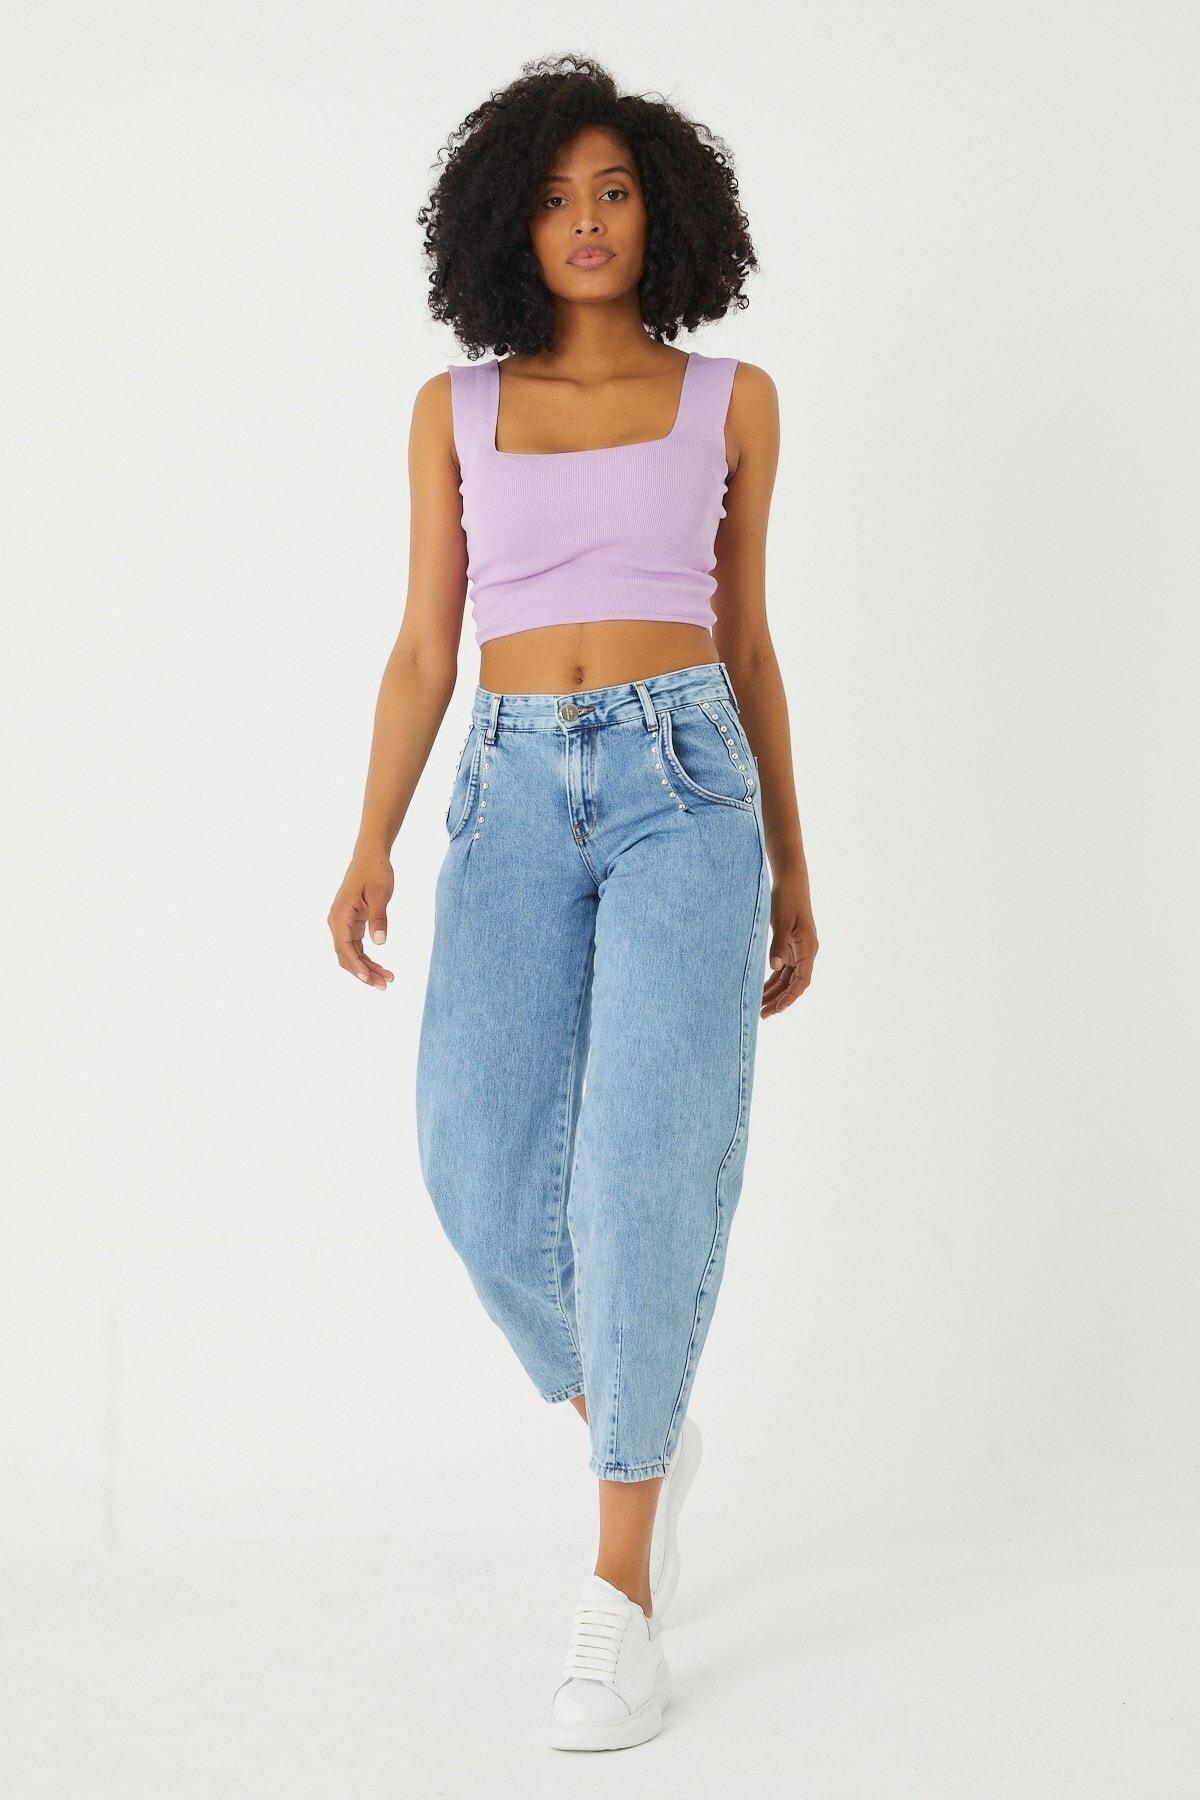 A.M.N Denim Normal Bel Trok Detaylı Paça Lastikli Boy Friend Denim Pantolon 1